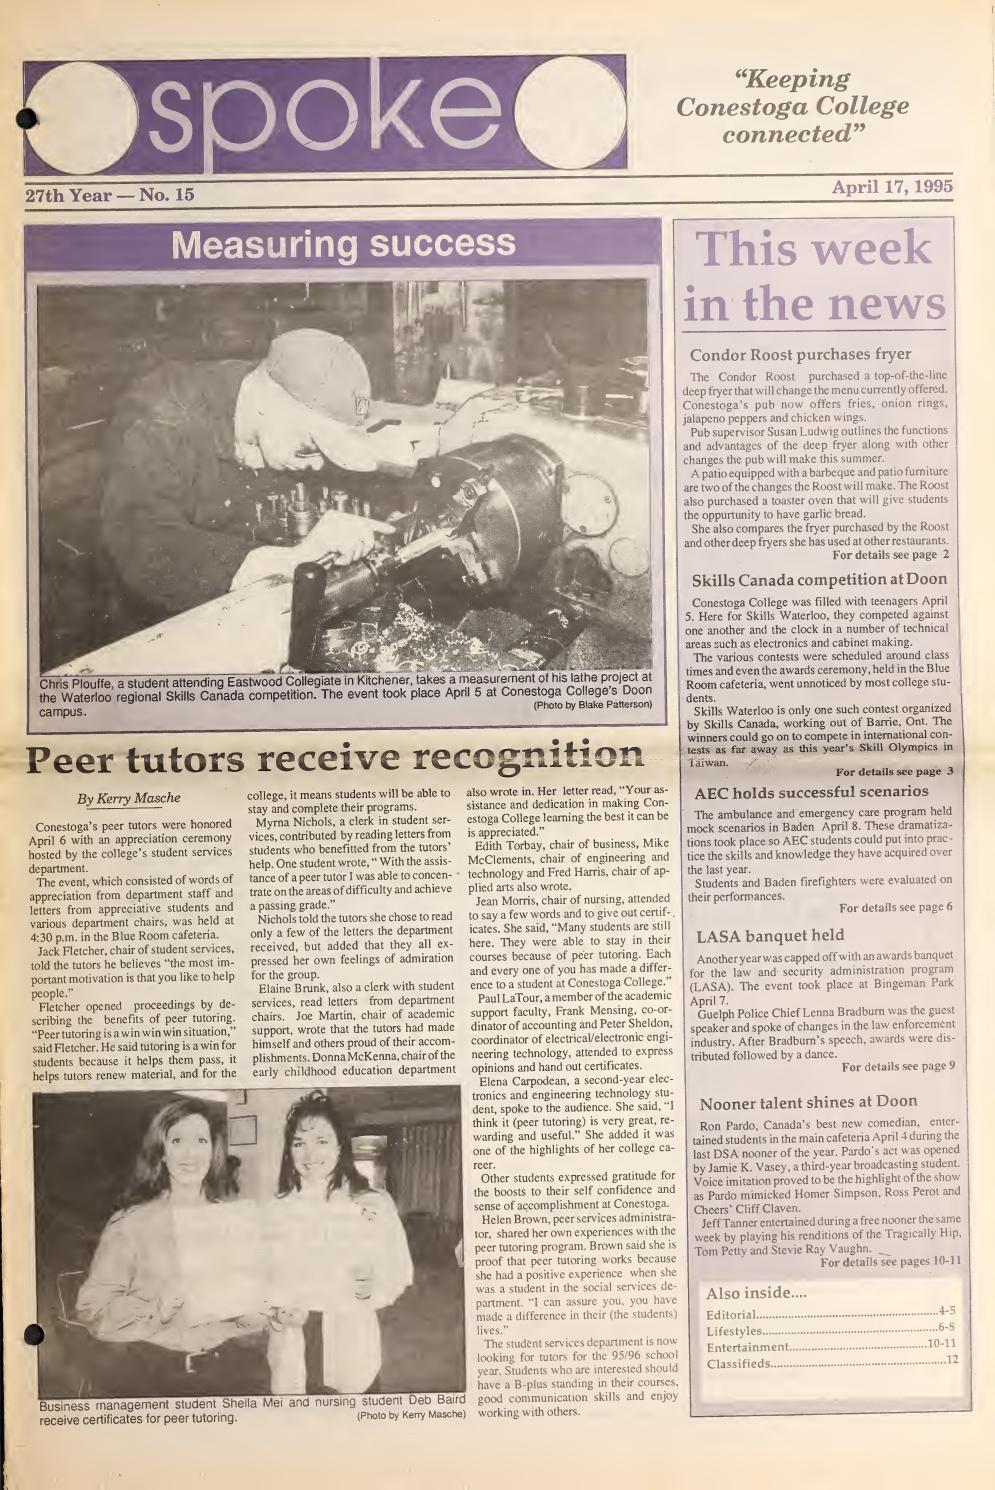 Digital Edition - April 17, 1995 by SPOKENewspaper - issuu